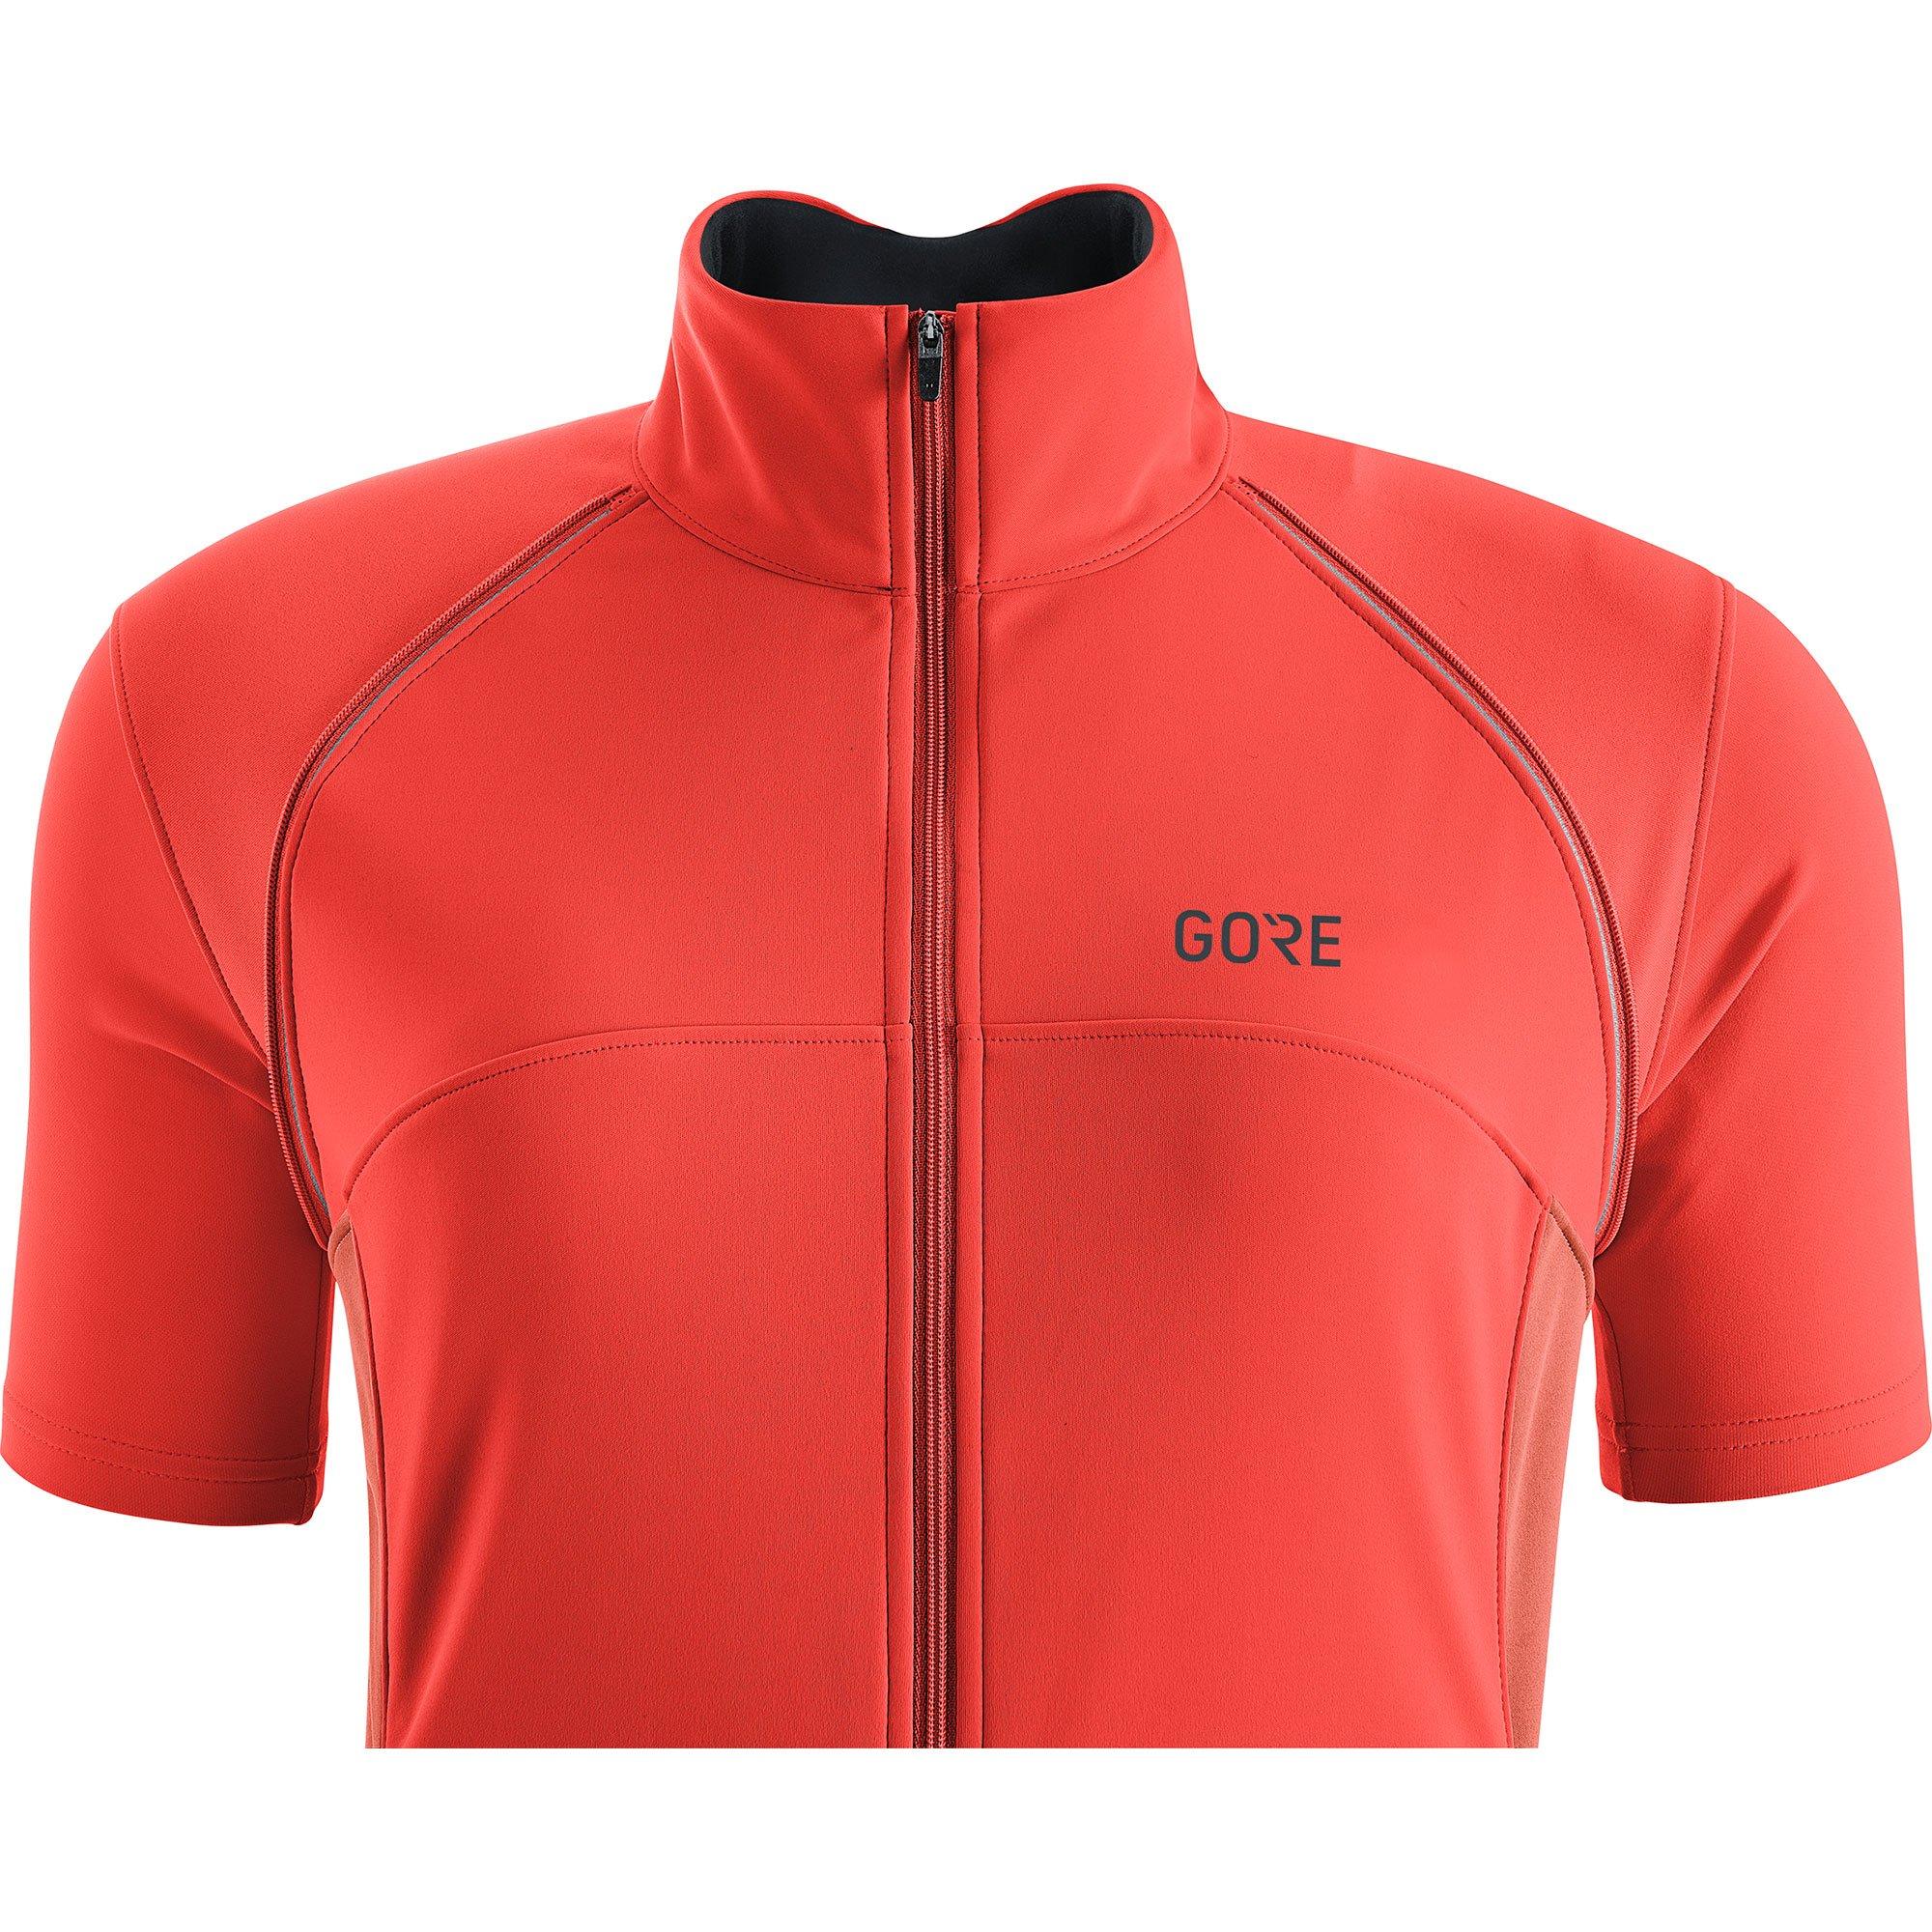 GORE Wear Women's Windproof Cycling Jacket, Removable Sleeves, GORE Wear C3 Women's GORE Wear WINDSTOPPER Phantom Zip-Off Jacket, Size: M, Color: Lumi Orange/Coral Glow, 100191 by GORE WEAR (Image #5)